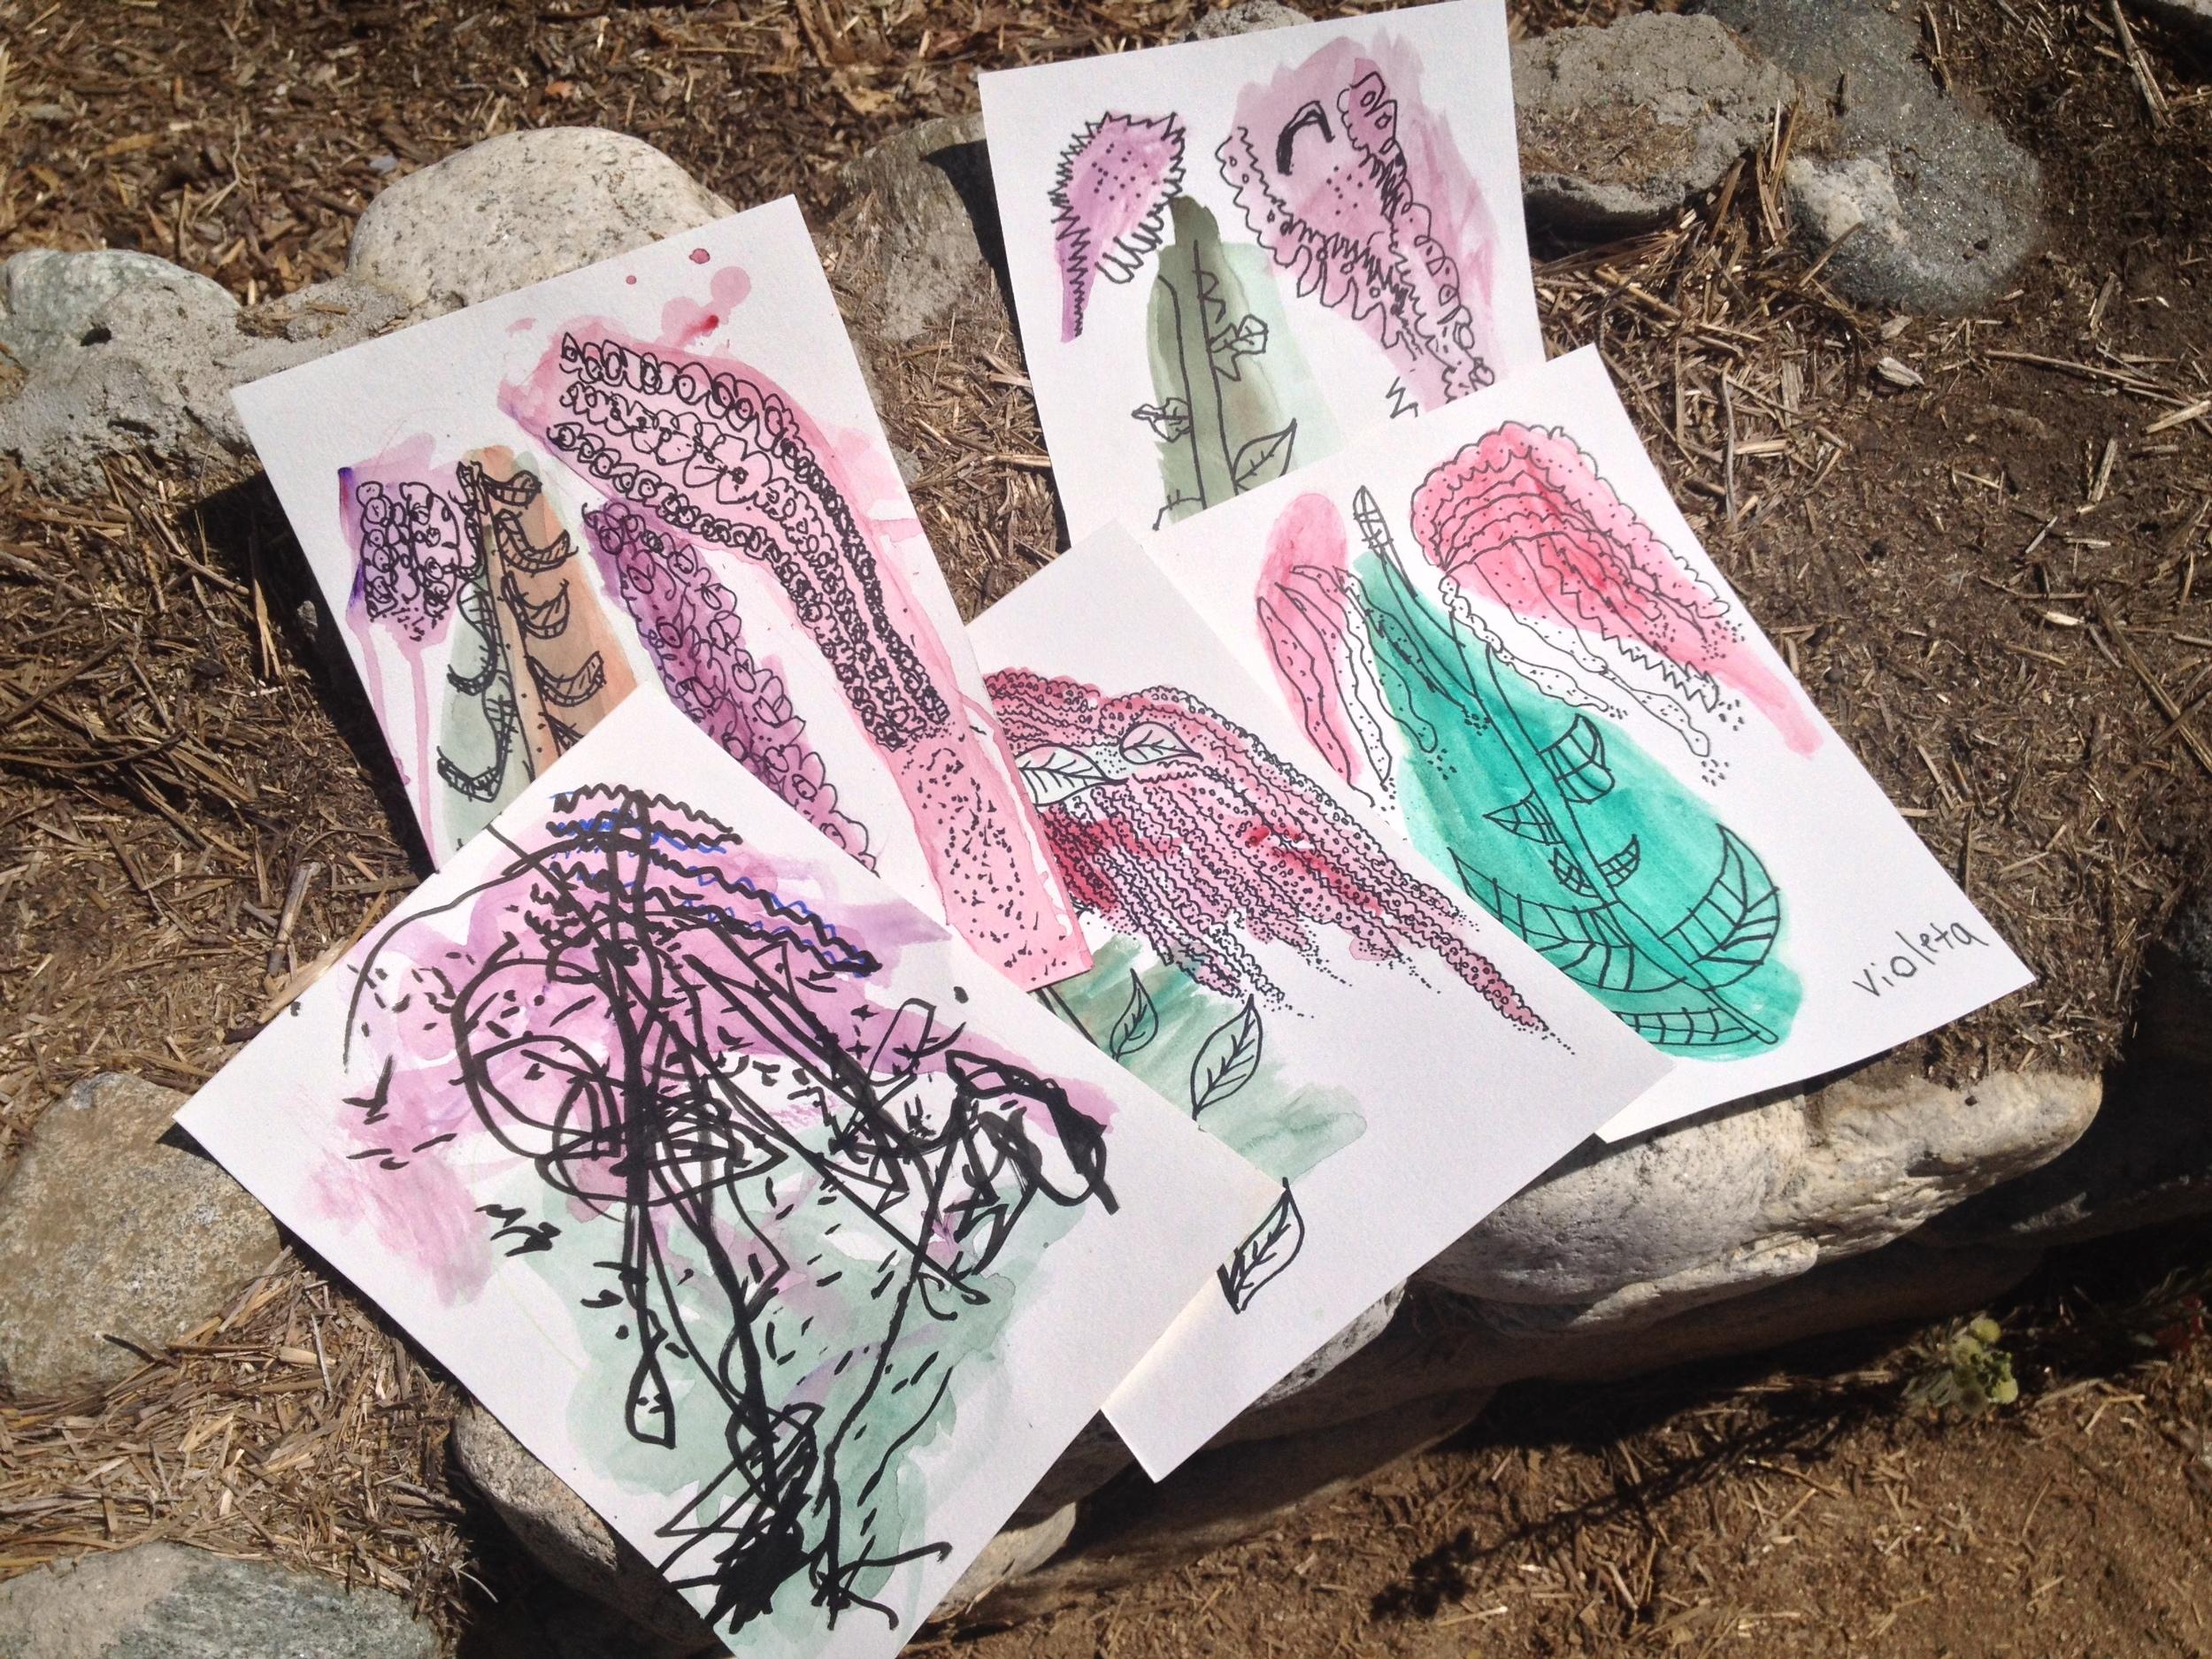 Milagro Allegro Community Garden, Highland Park, California 2015- painting class given by guest artist Sabrina Sosa